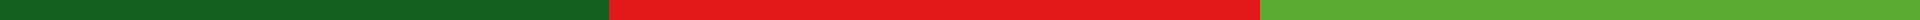 ancroft-top-banner